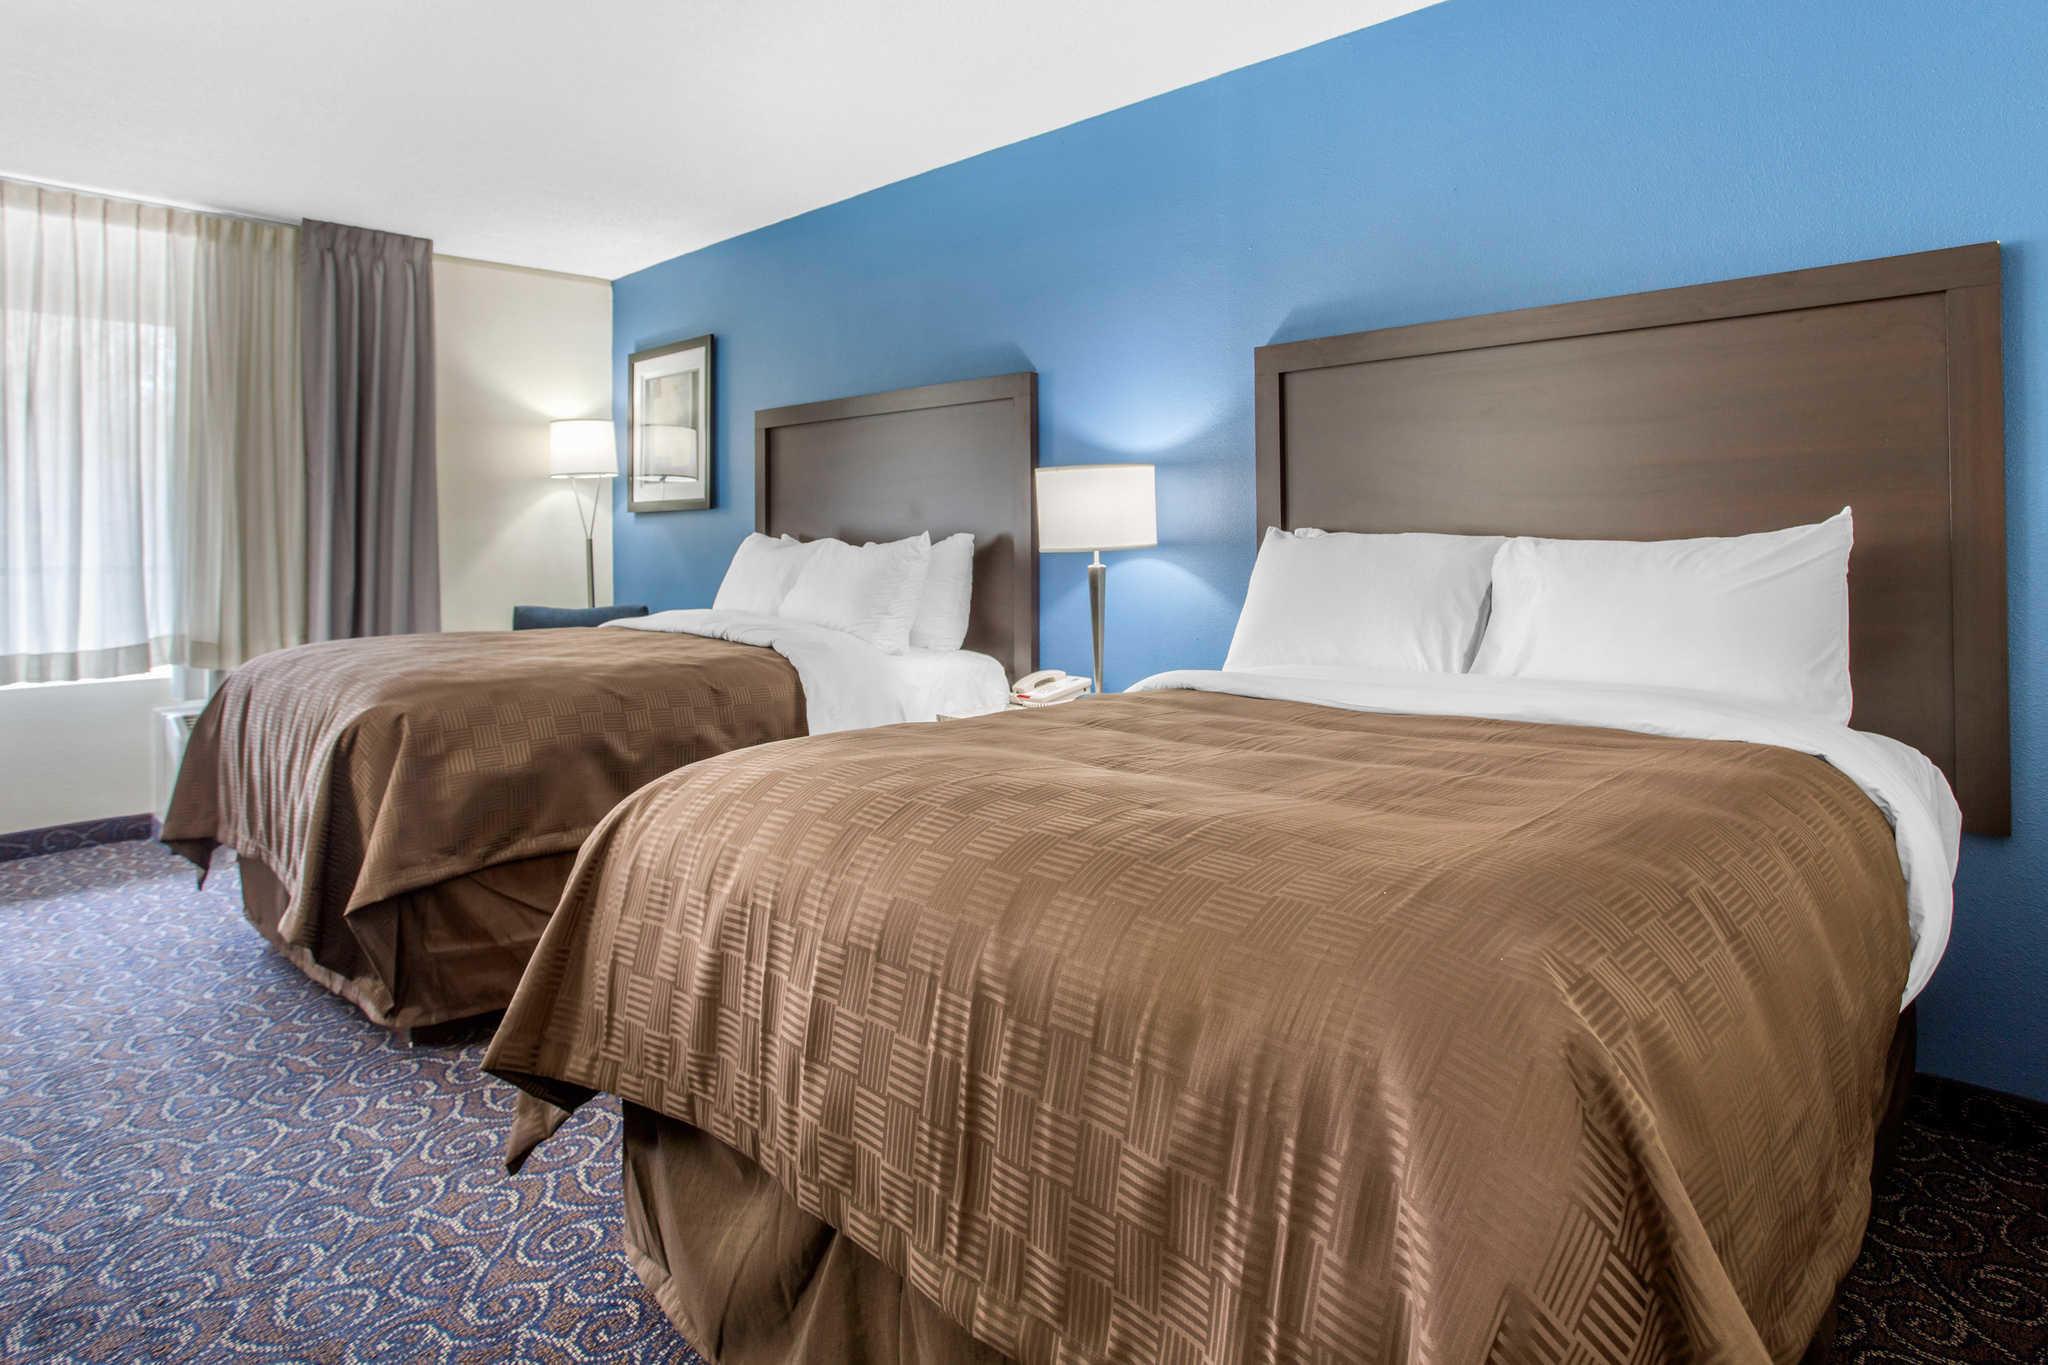 Clarion Inn & Suites image 10